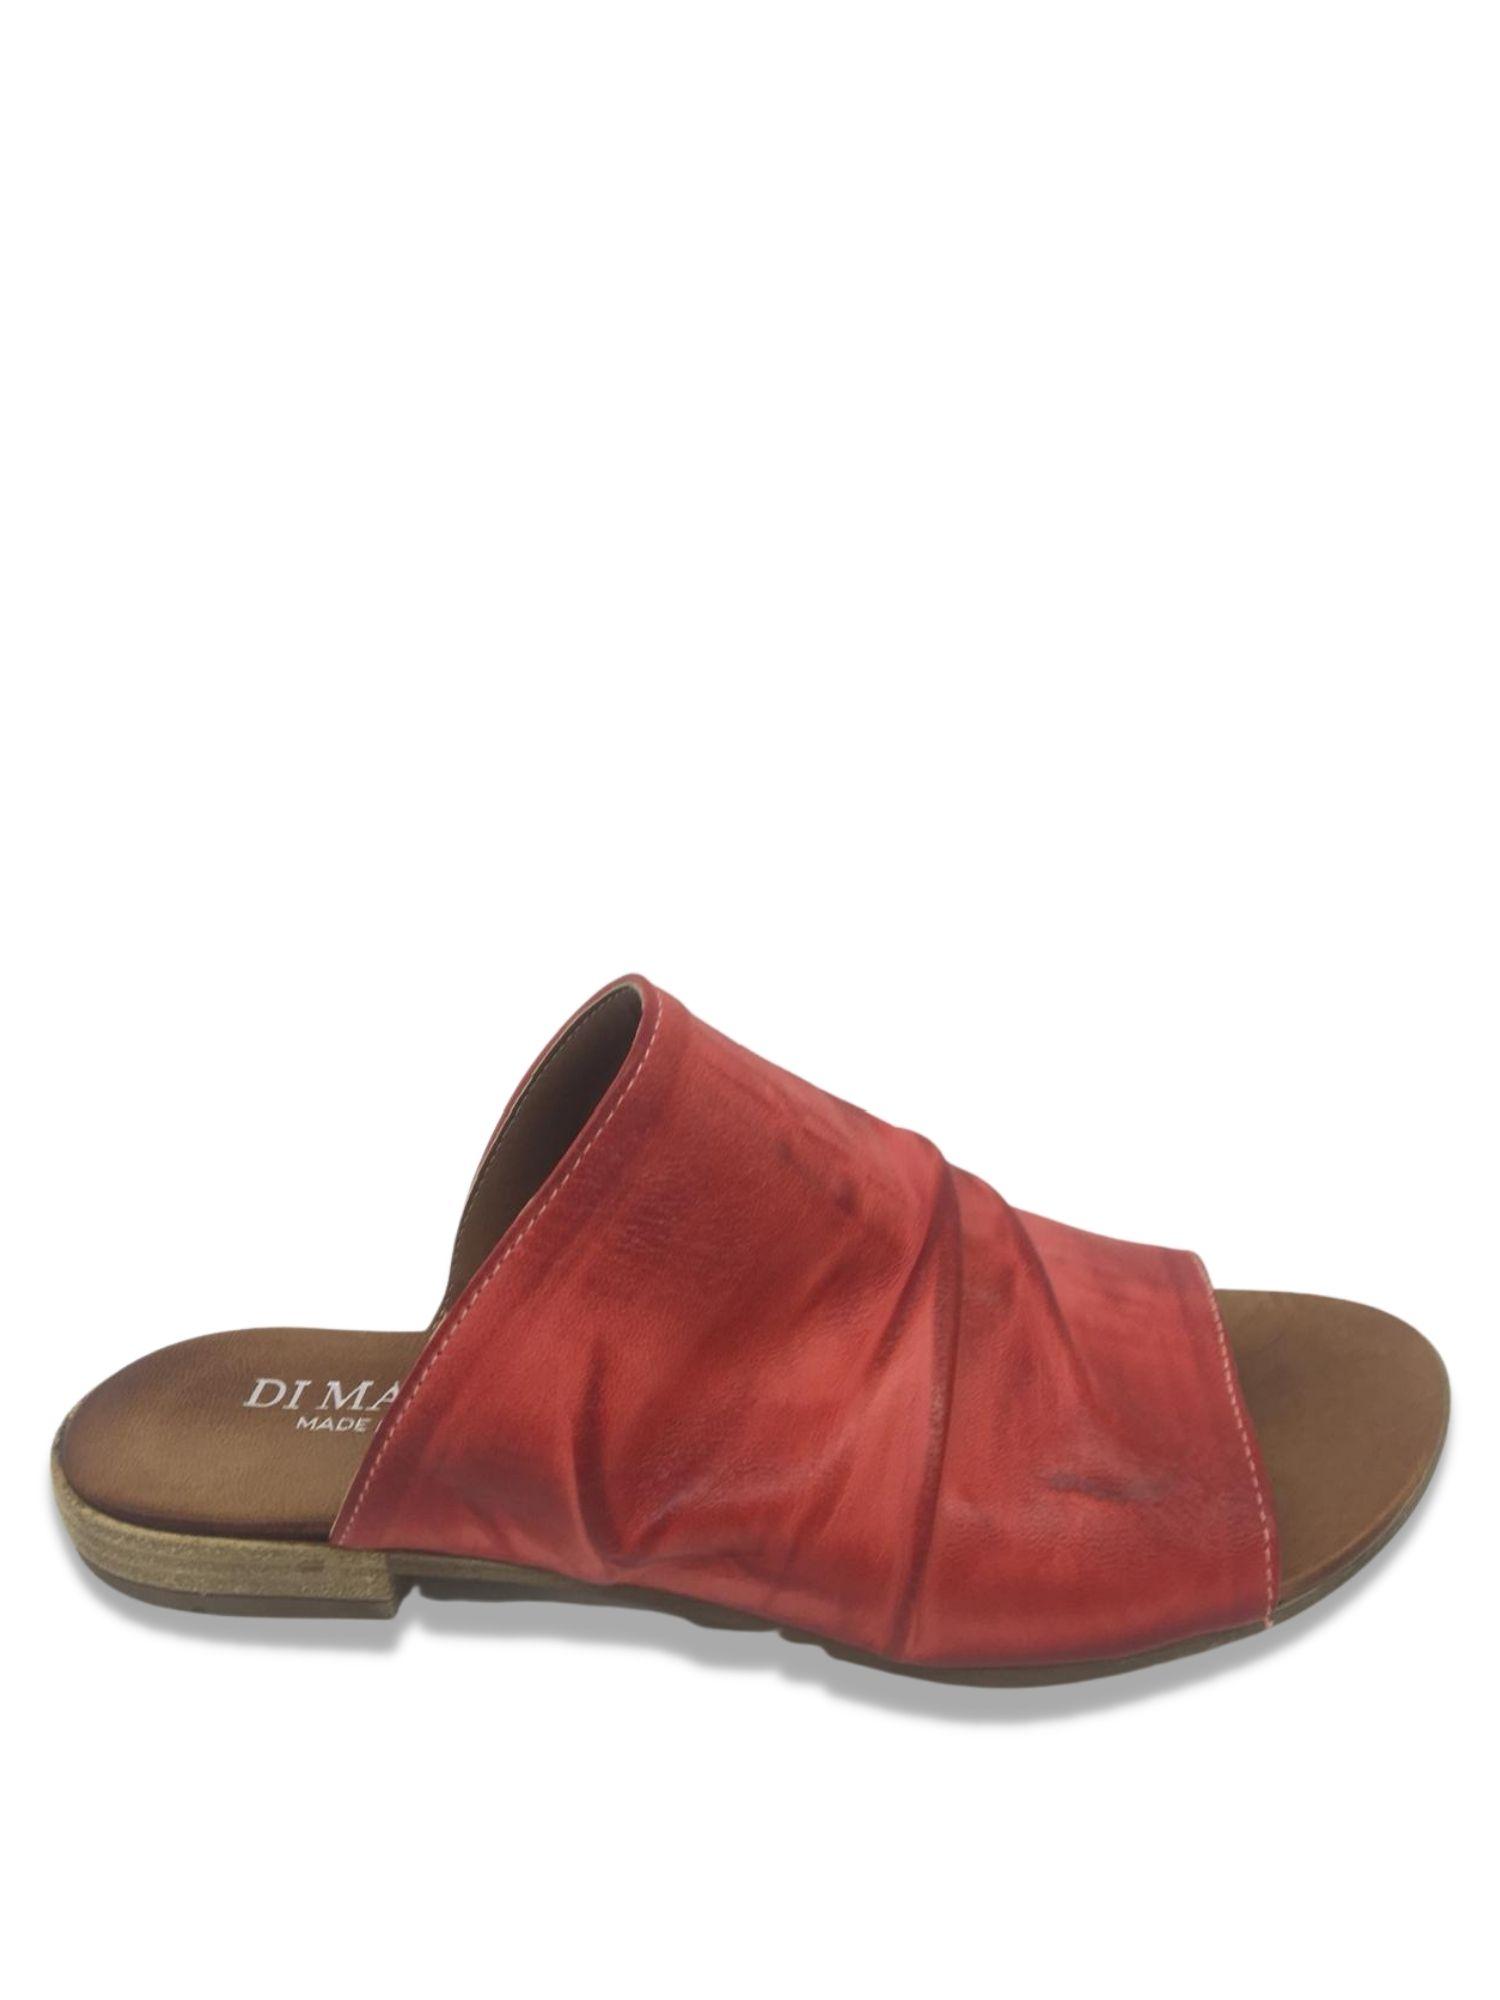 Sandalo Scalzato Made in Italy 207 Rosso